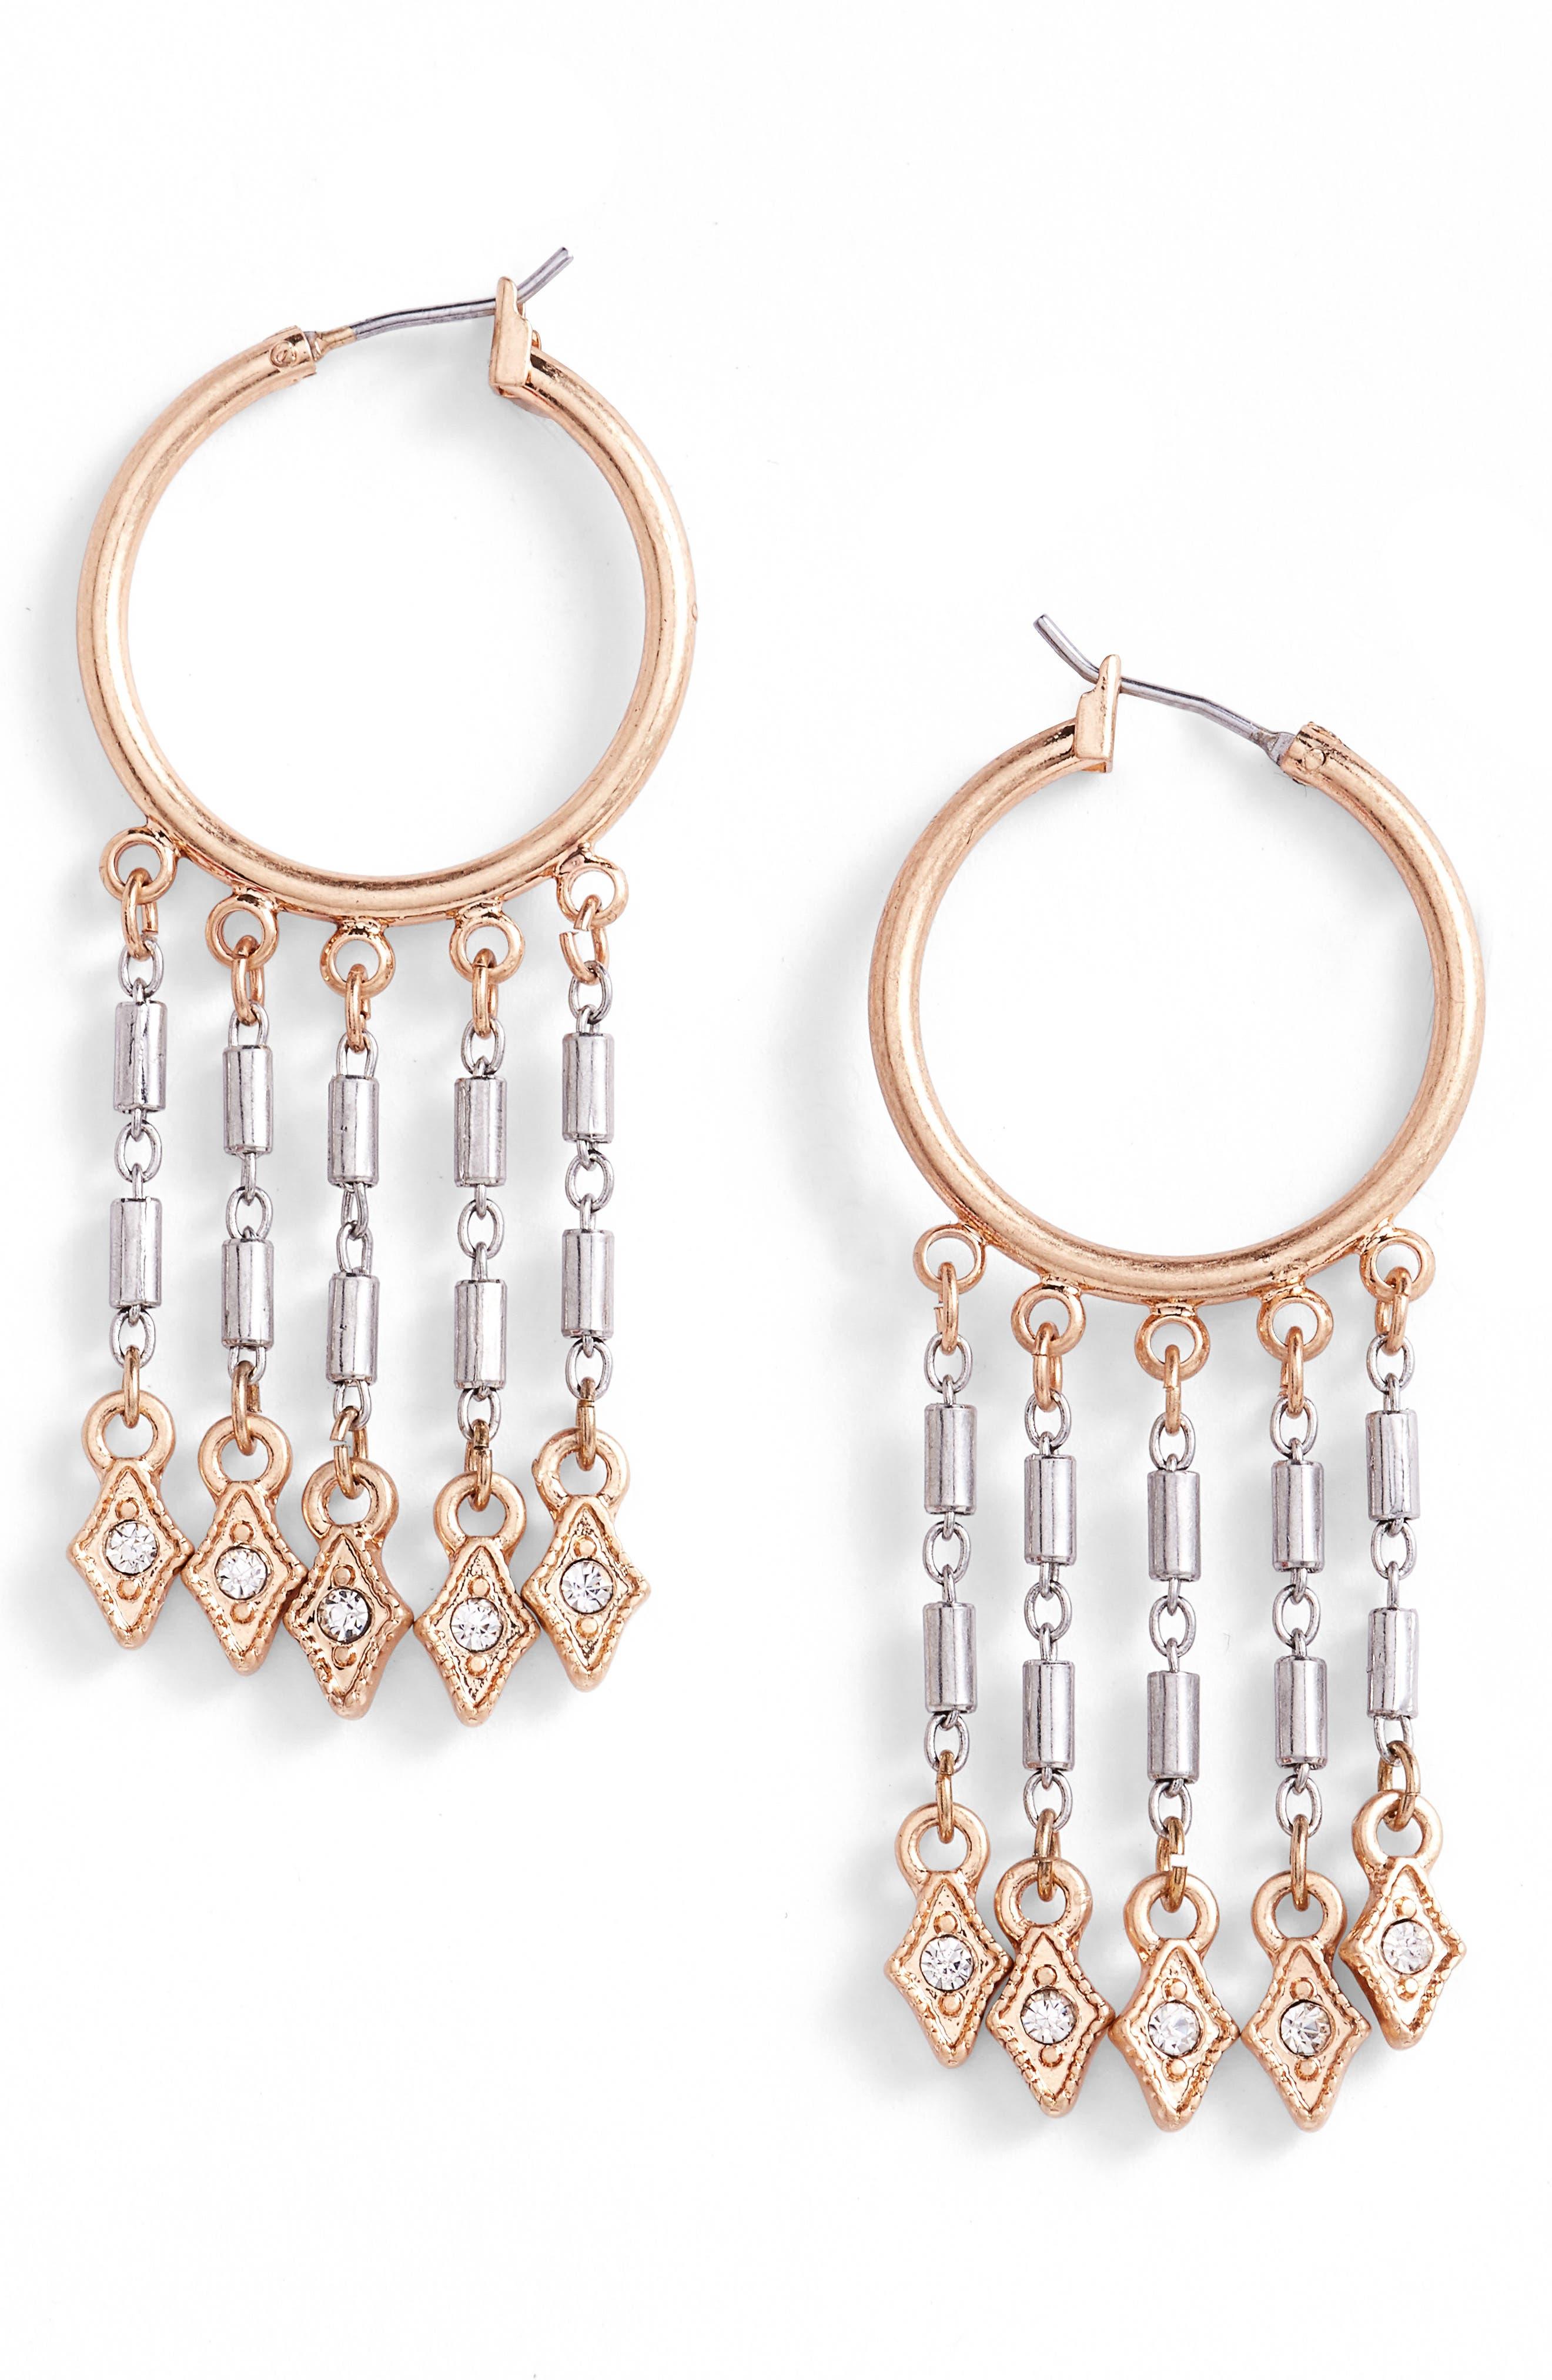 Medium Fringe Hoop Earrings,                         Main,                         color, Clear- Gold- Rhodium